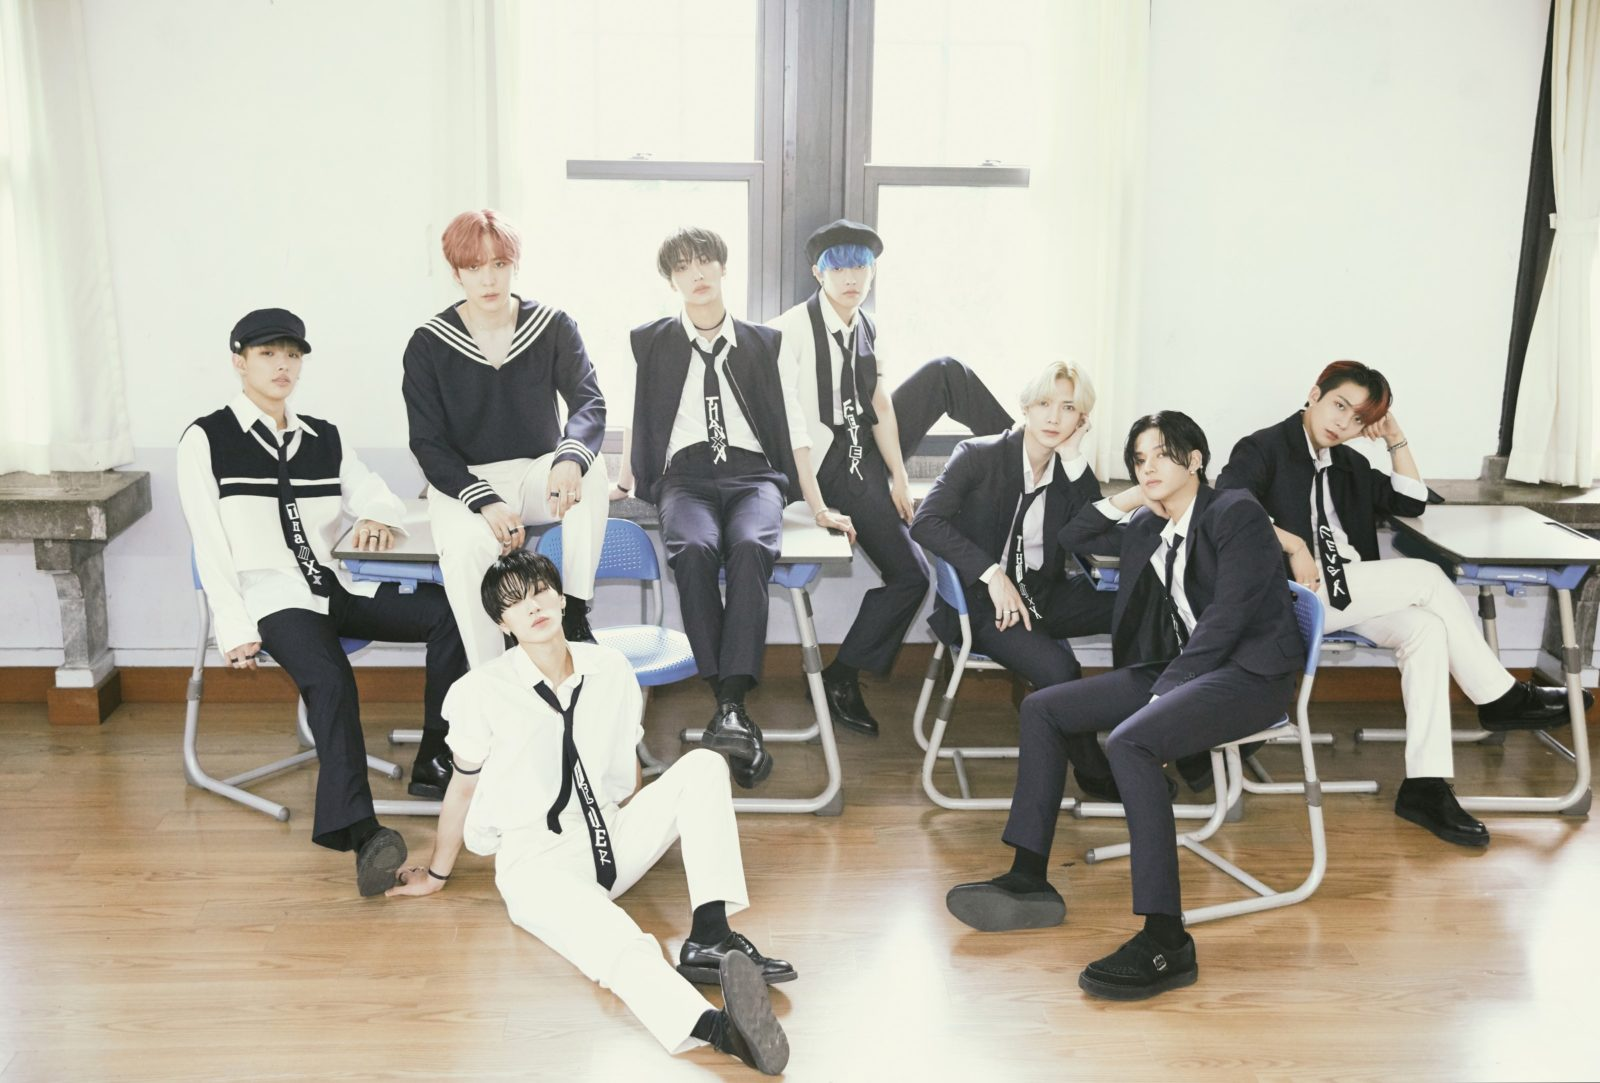 K-POPグループ・ATEEZ、新アルバムが発売1日で販売枚数11万枚突破サムネイル画像!